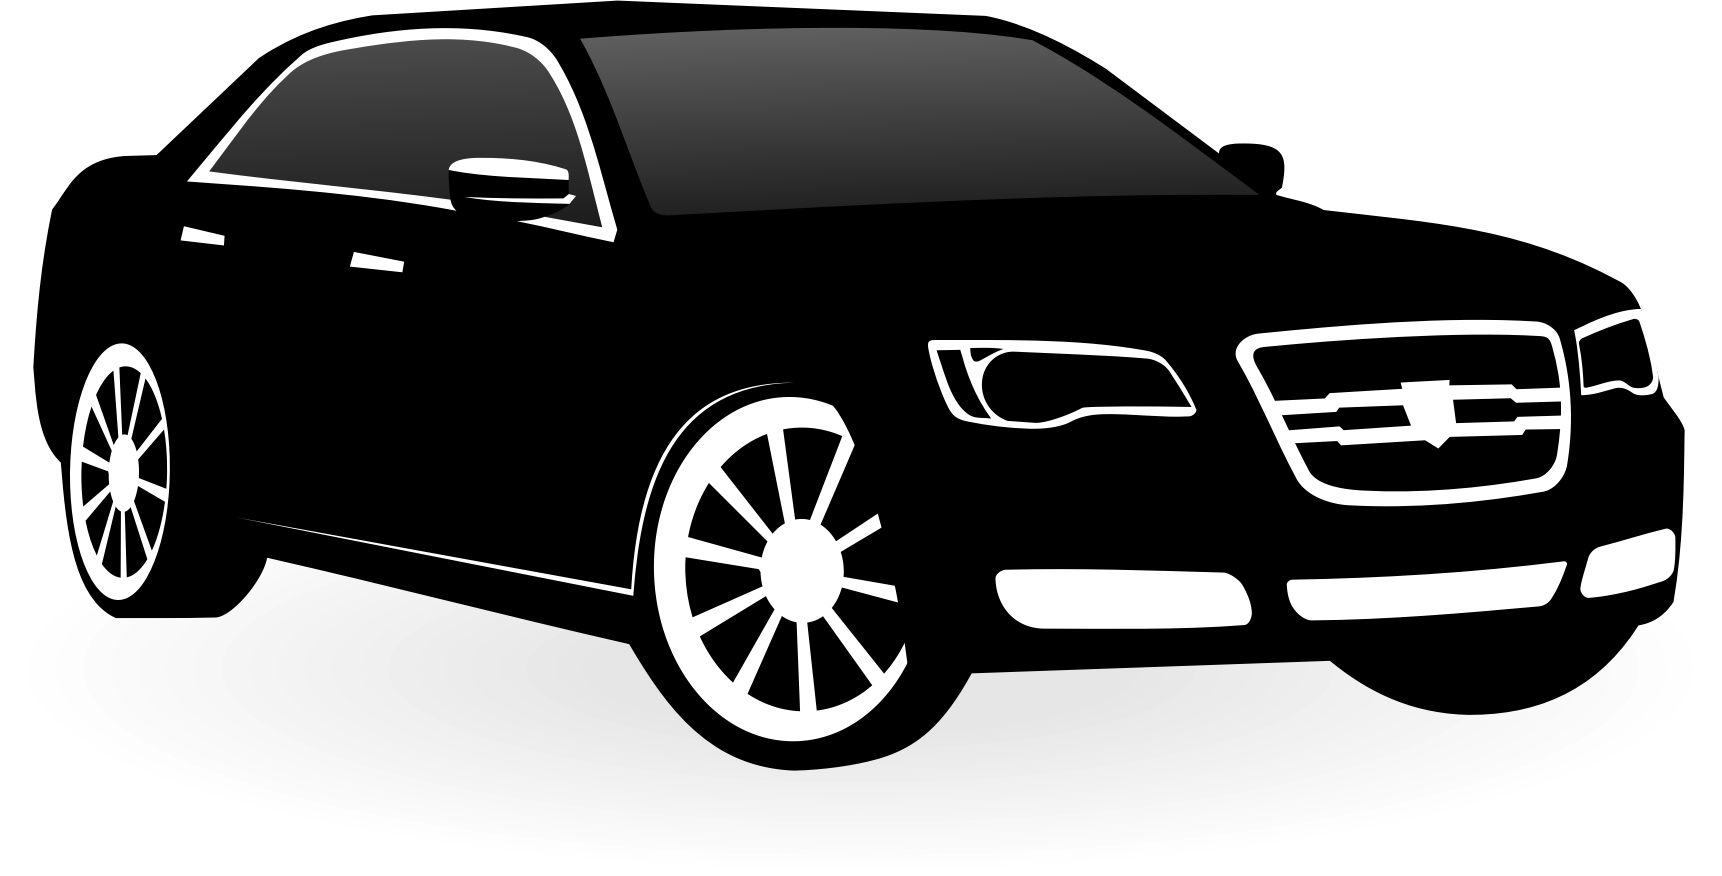 Chrysler c big image. Clipart car vector